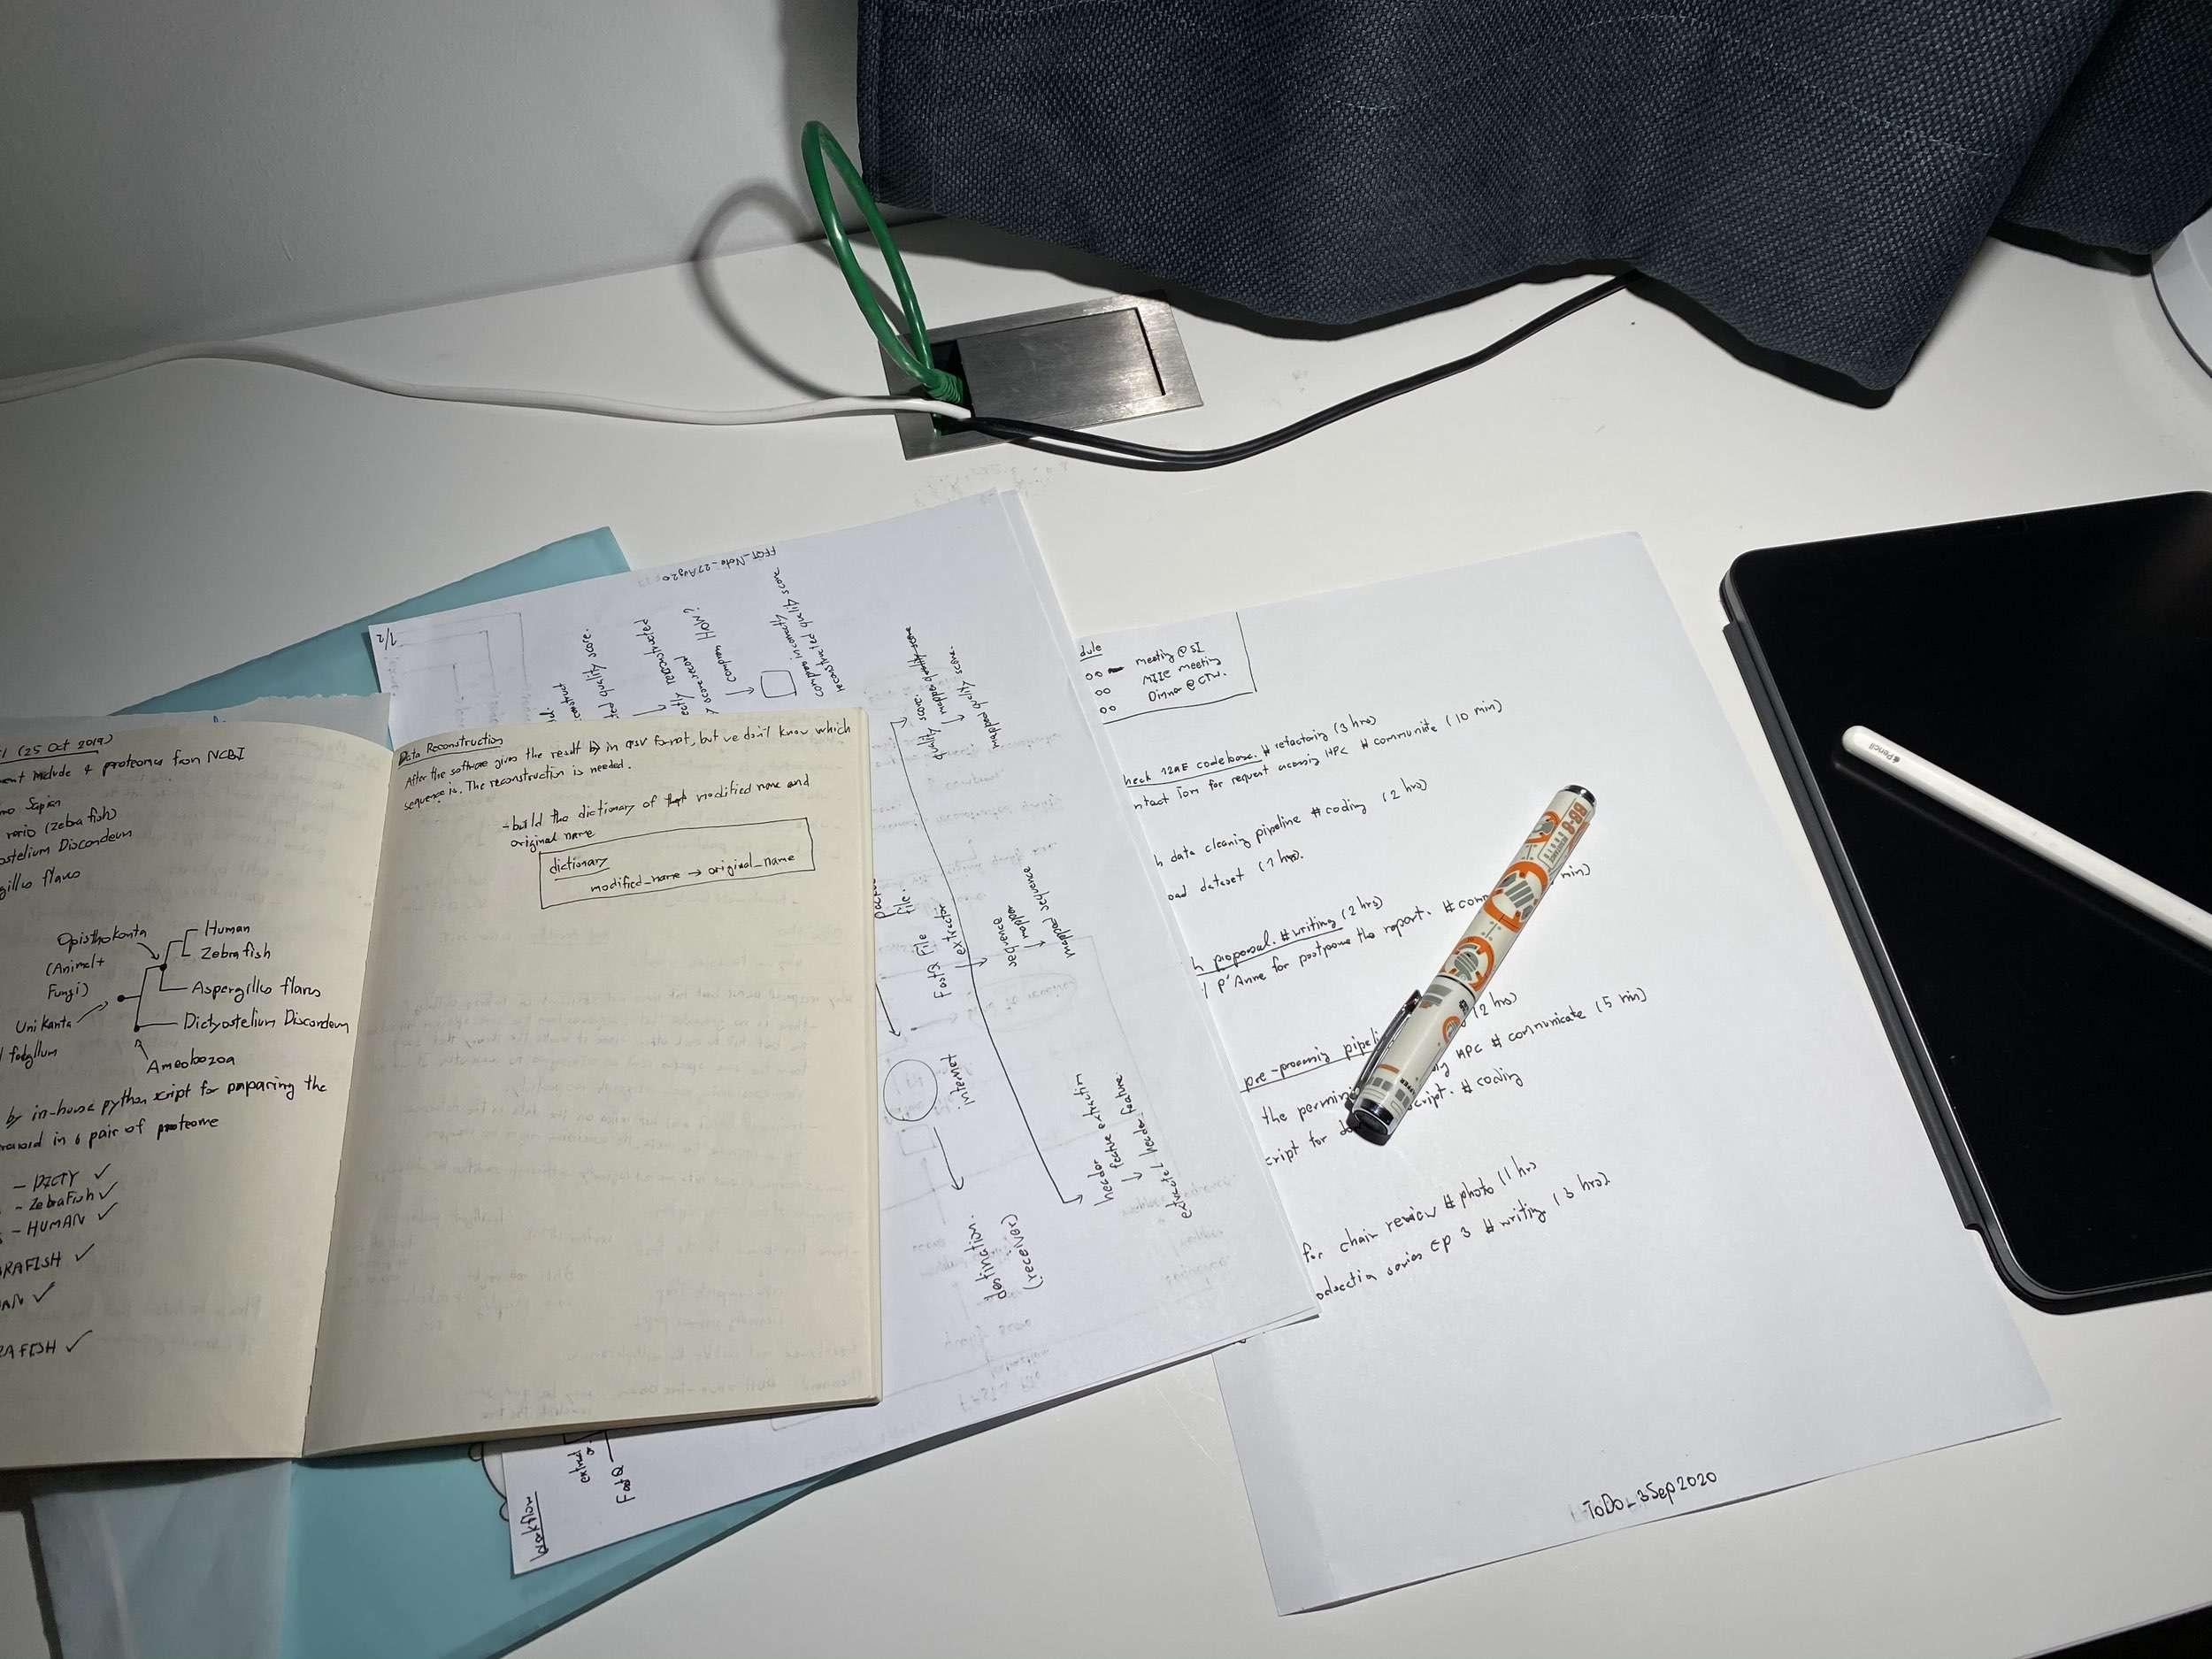 Productive Series: To-Do List ทำดี มีเวลาว่างเพิ่มขึ้นเยอะ